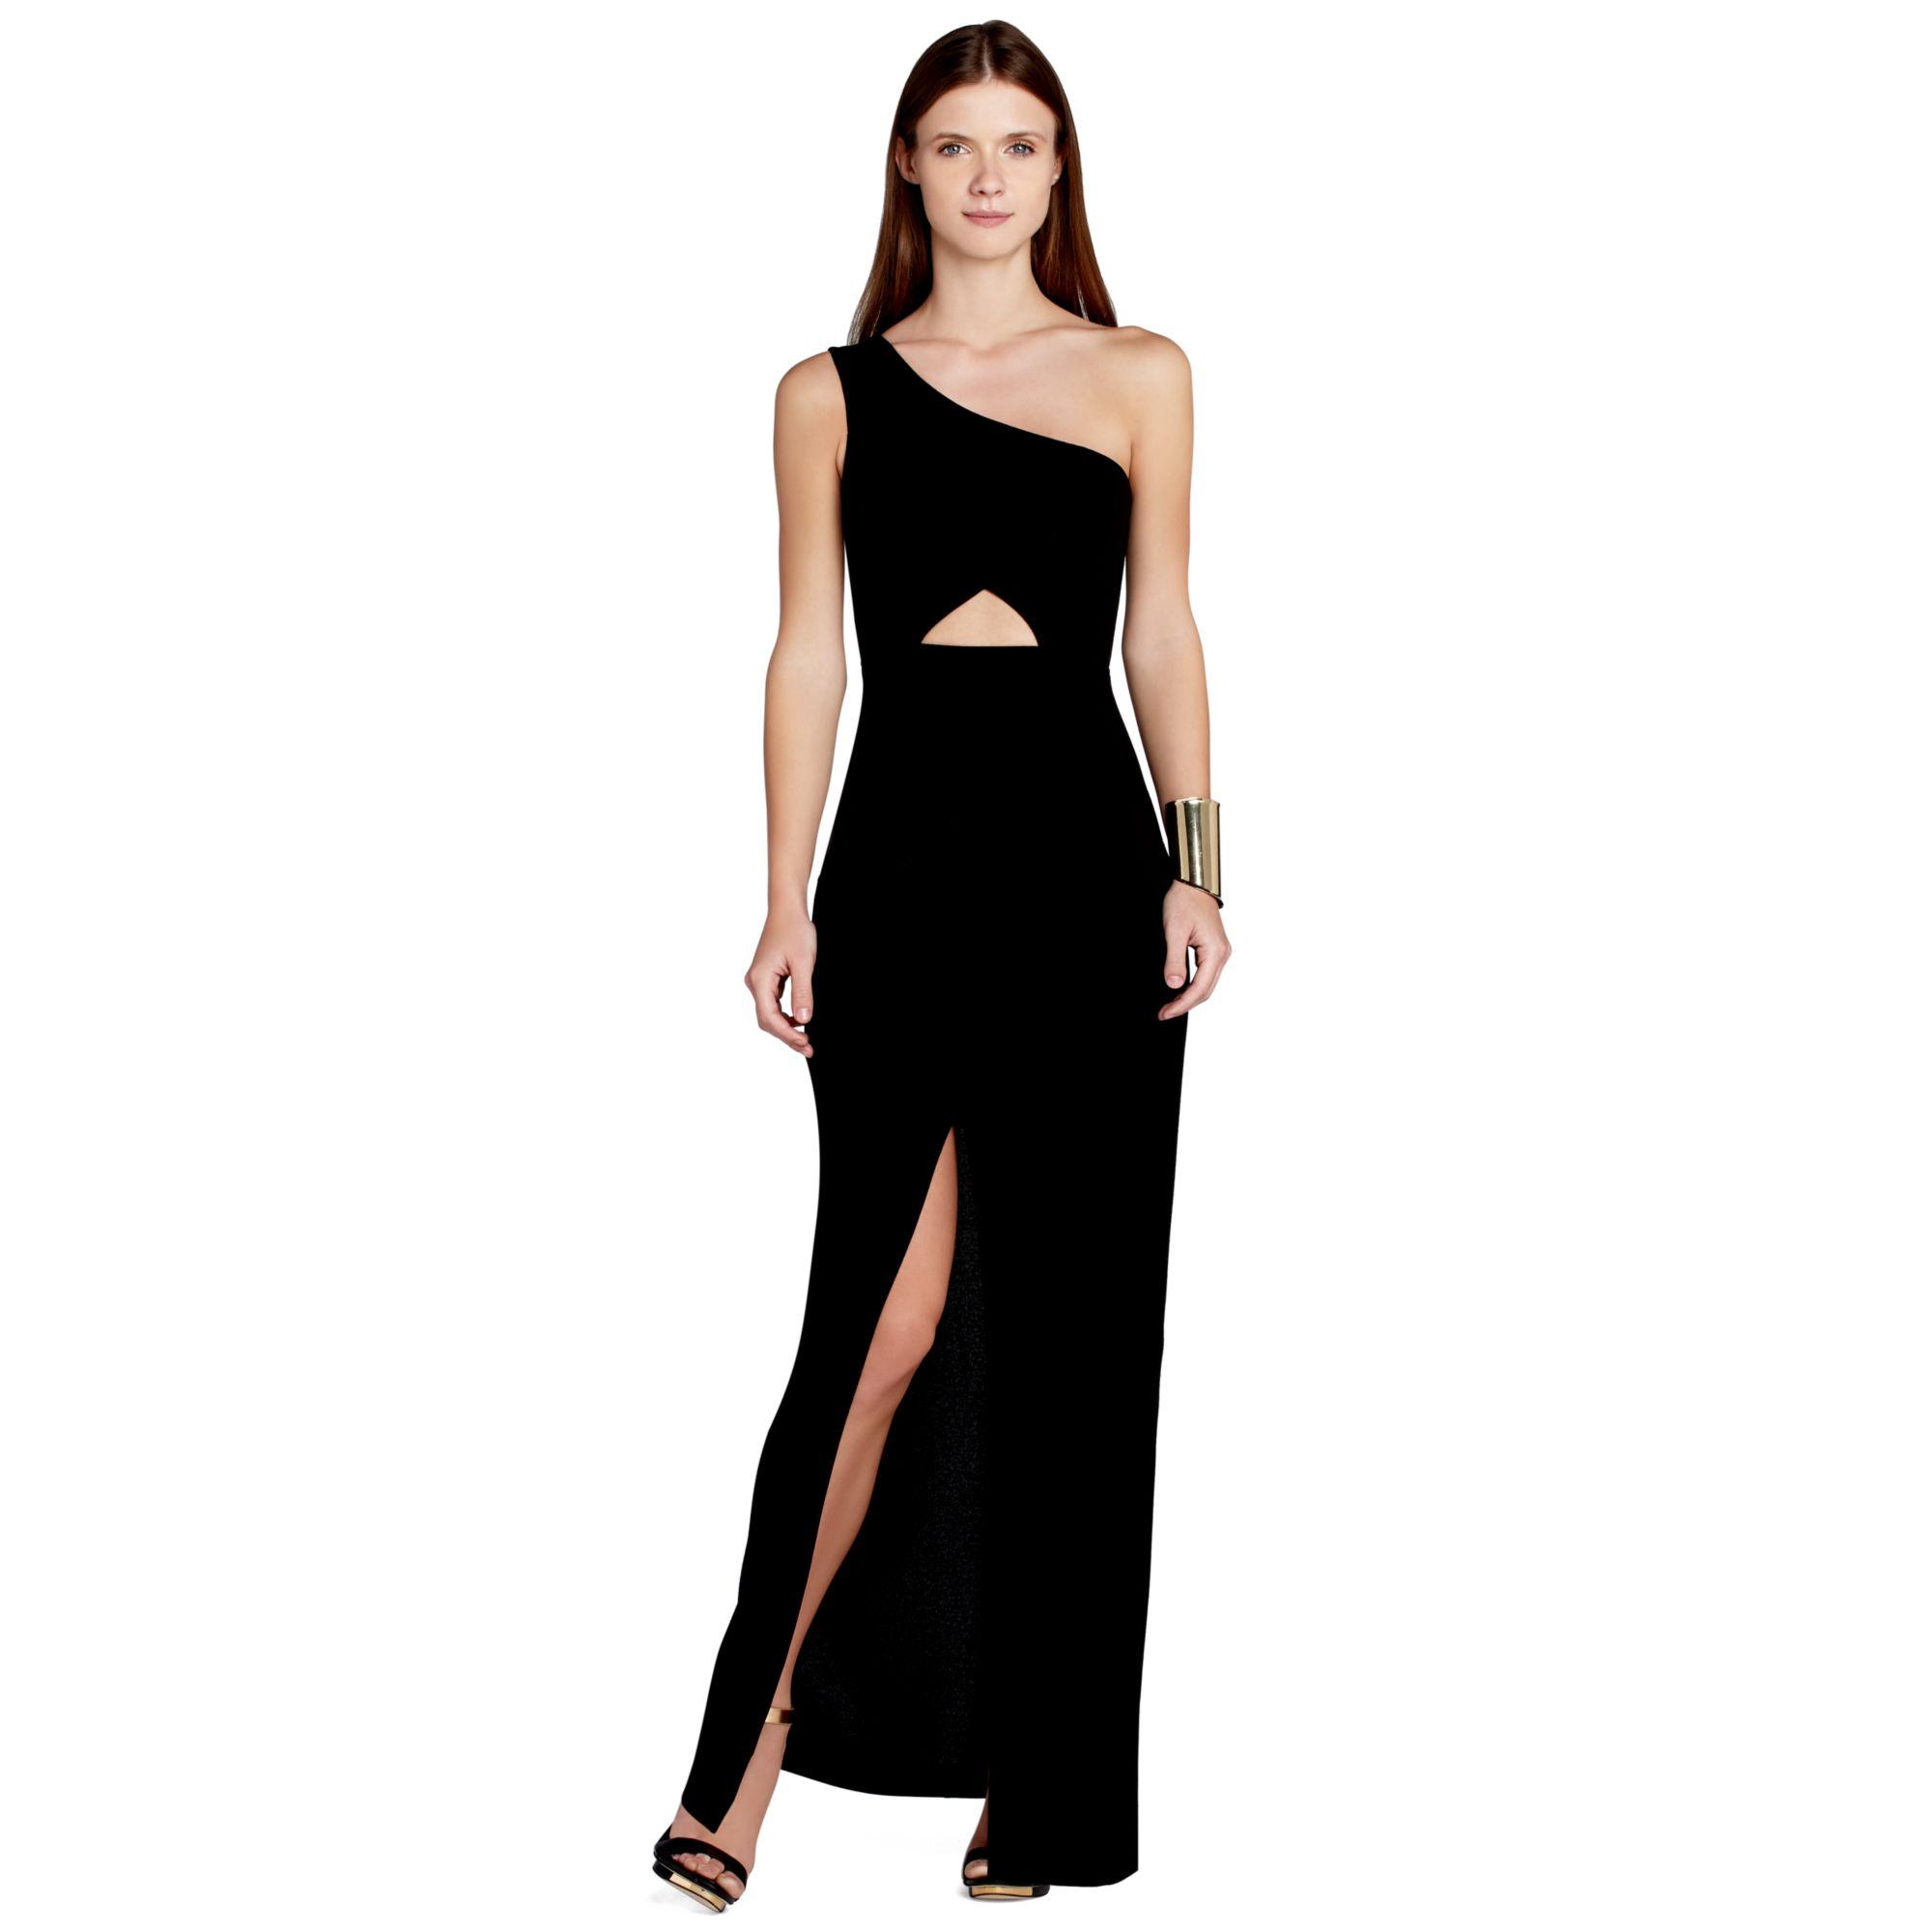 Lyst - Bcbgmaxazria Maxazria Oneshoulder Cutout Gown in Black